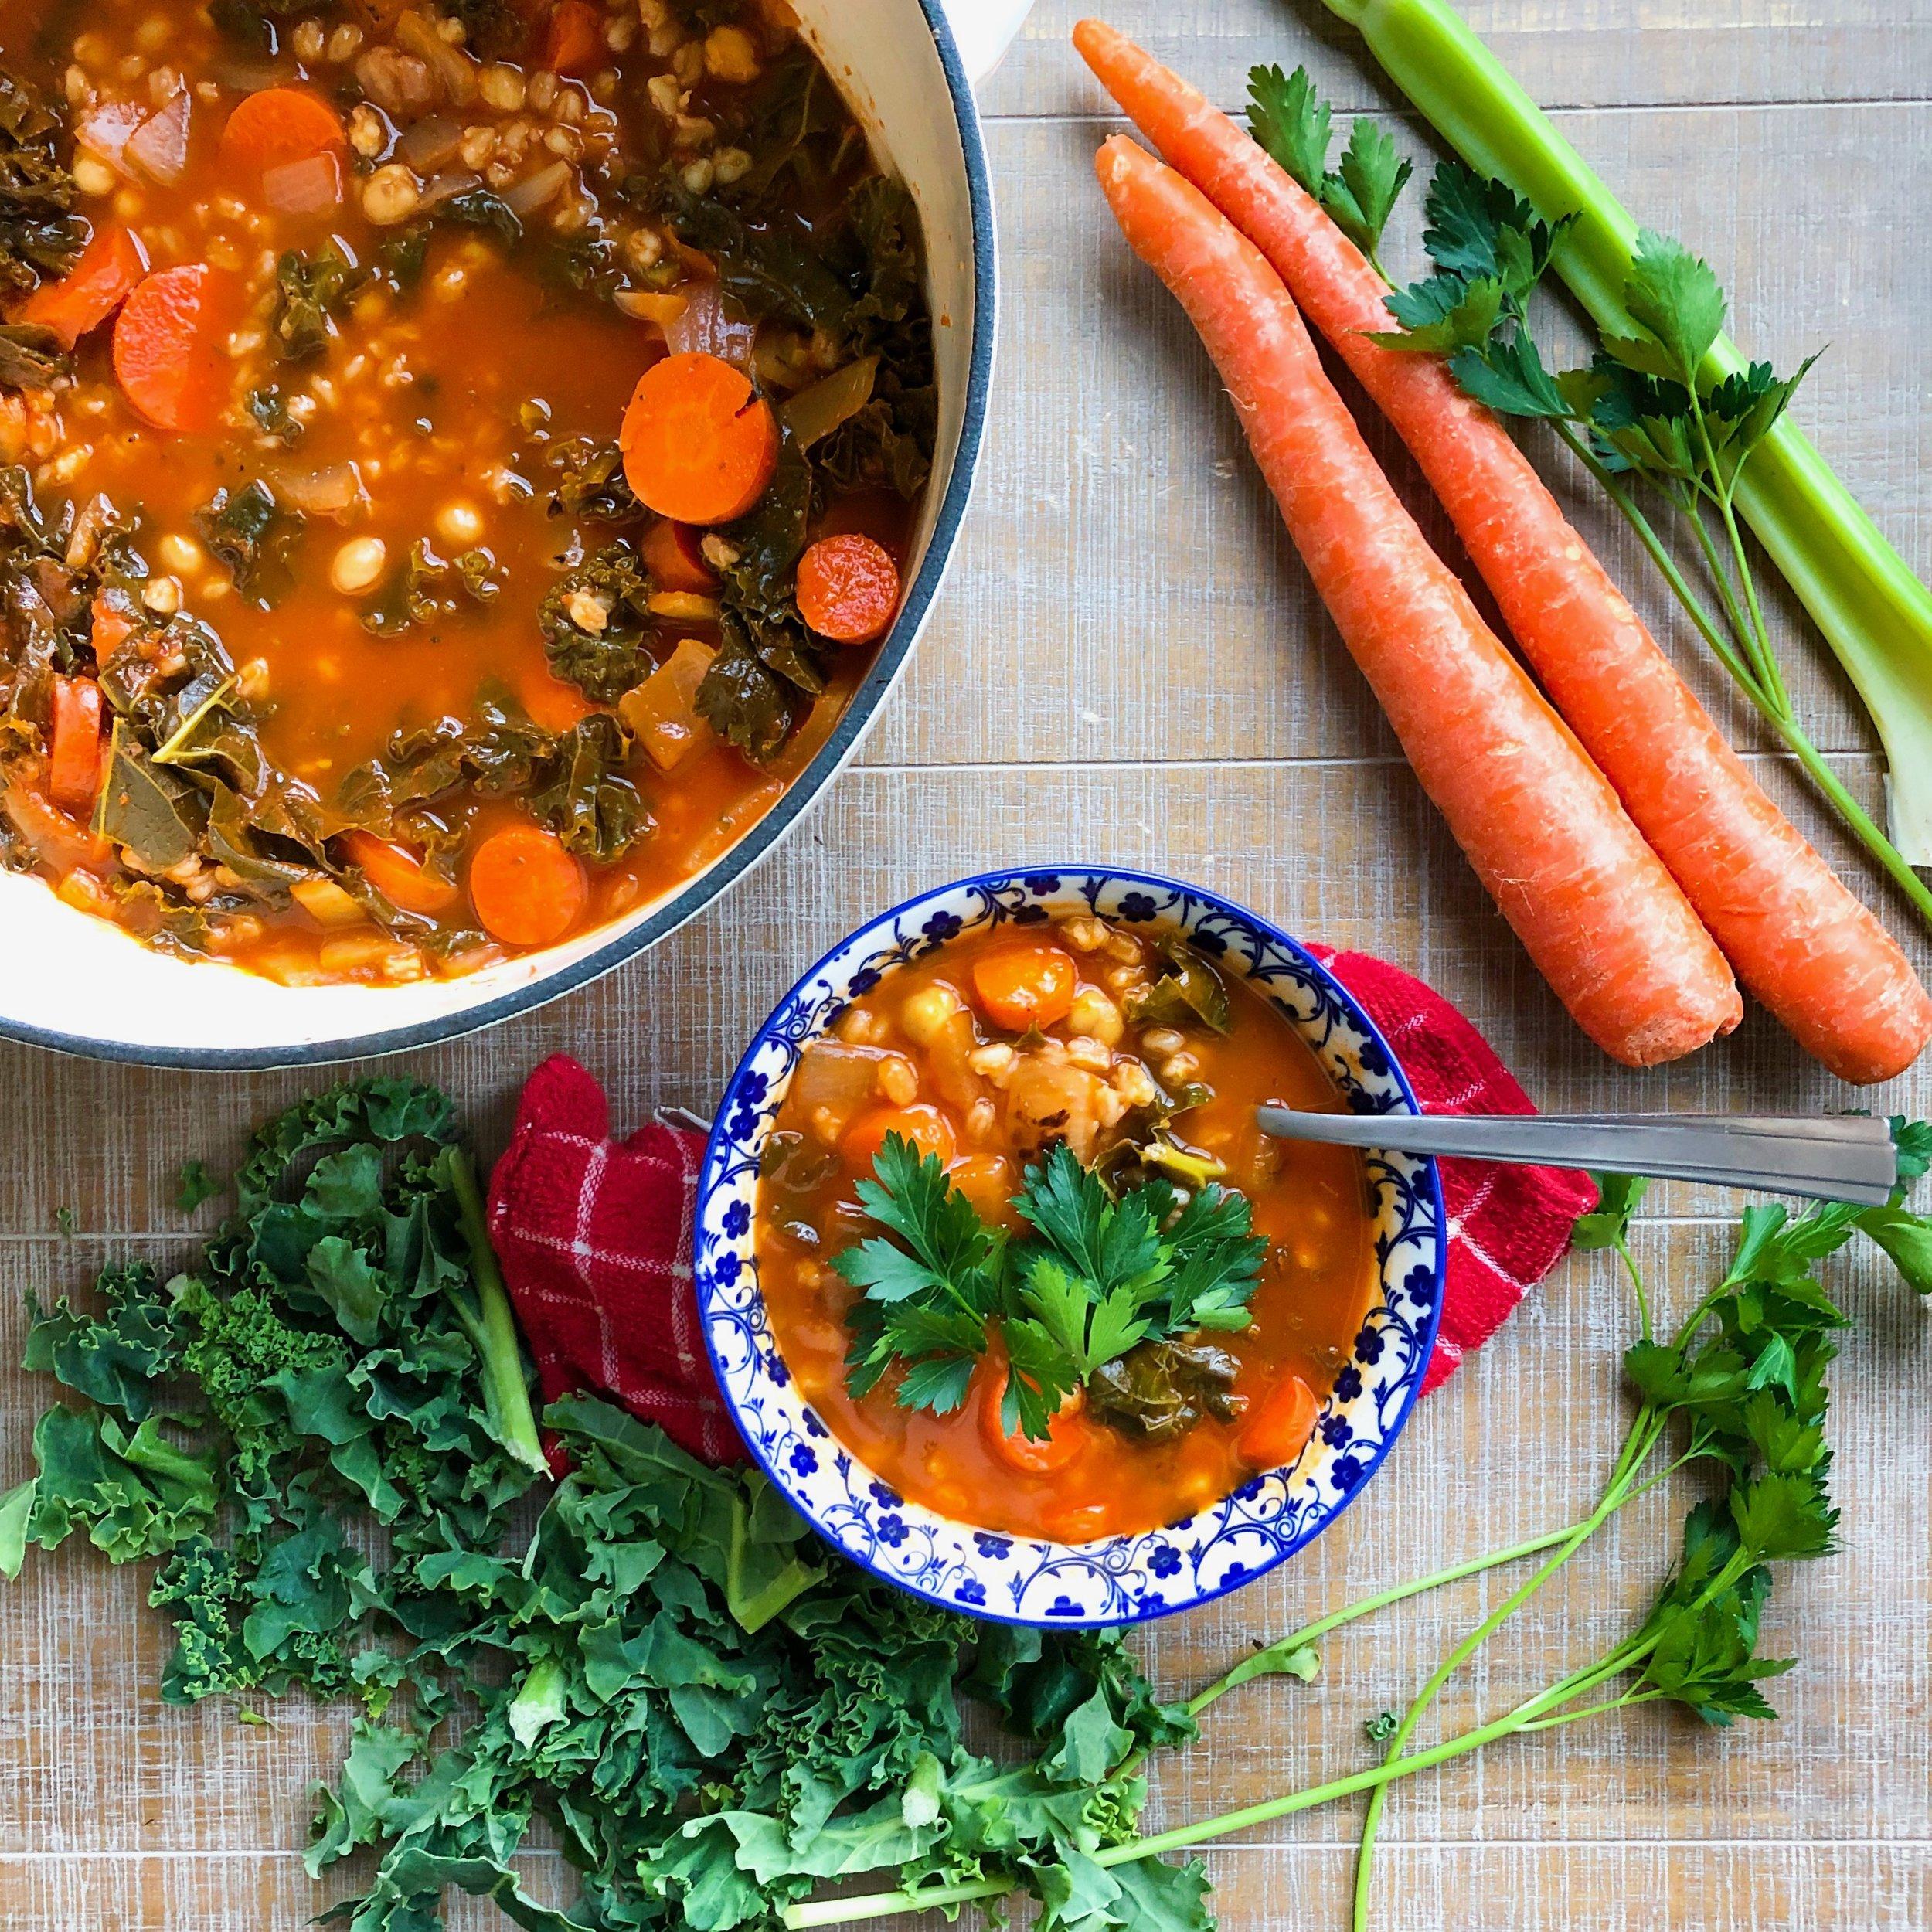 Minestrone Soup - DAIRY-FREE, VEGAN, GLUTEN-FREE (OPTIONAL), MEAL PREP